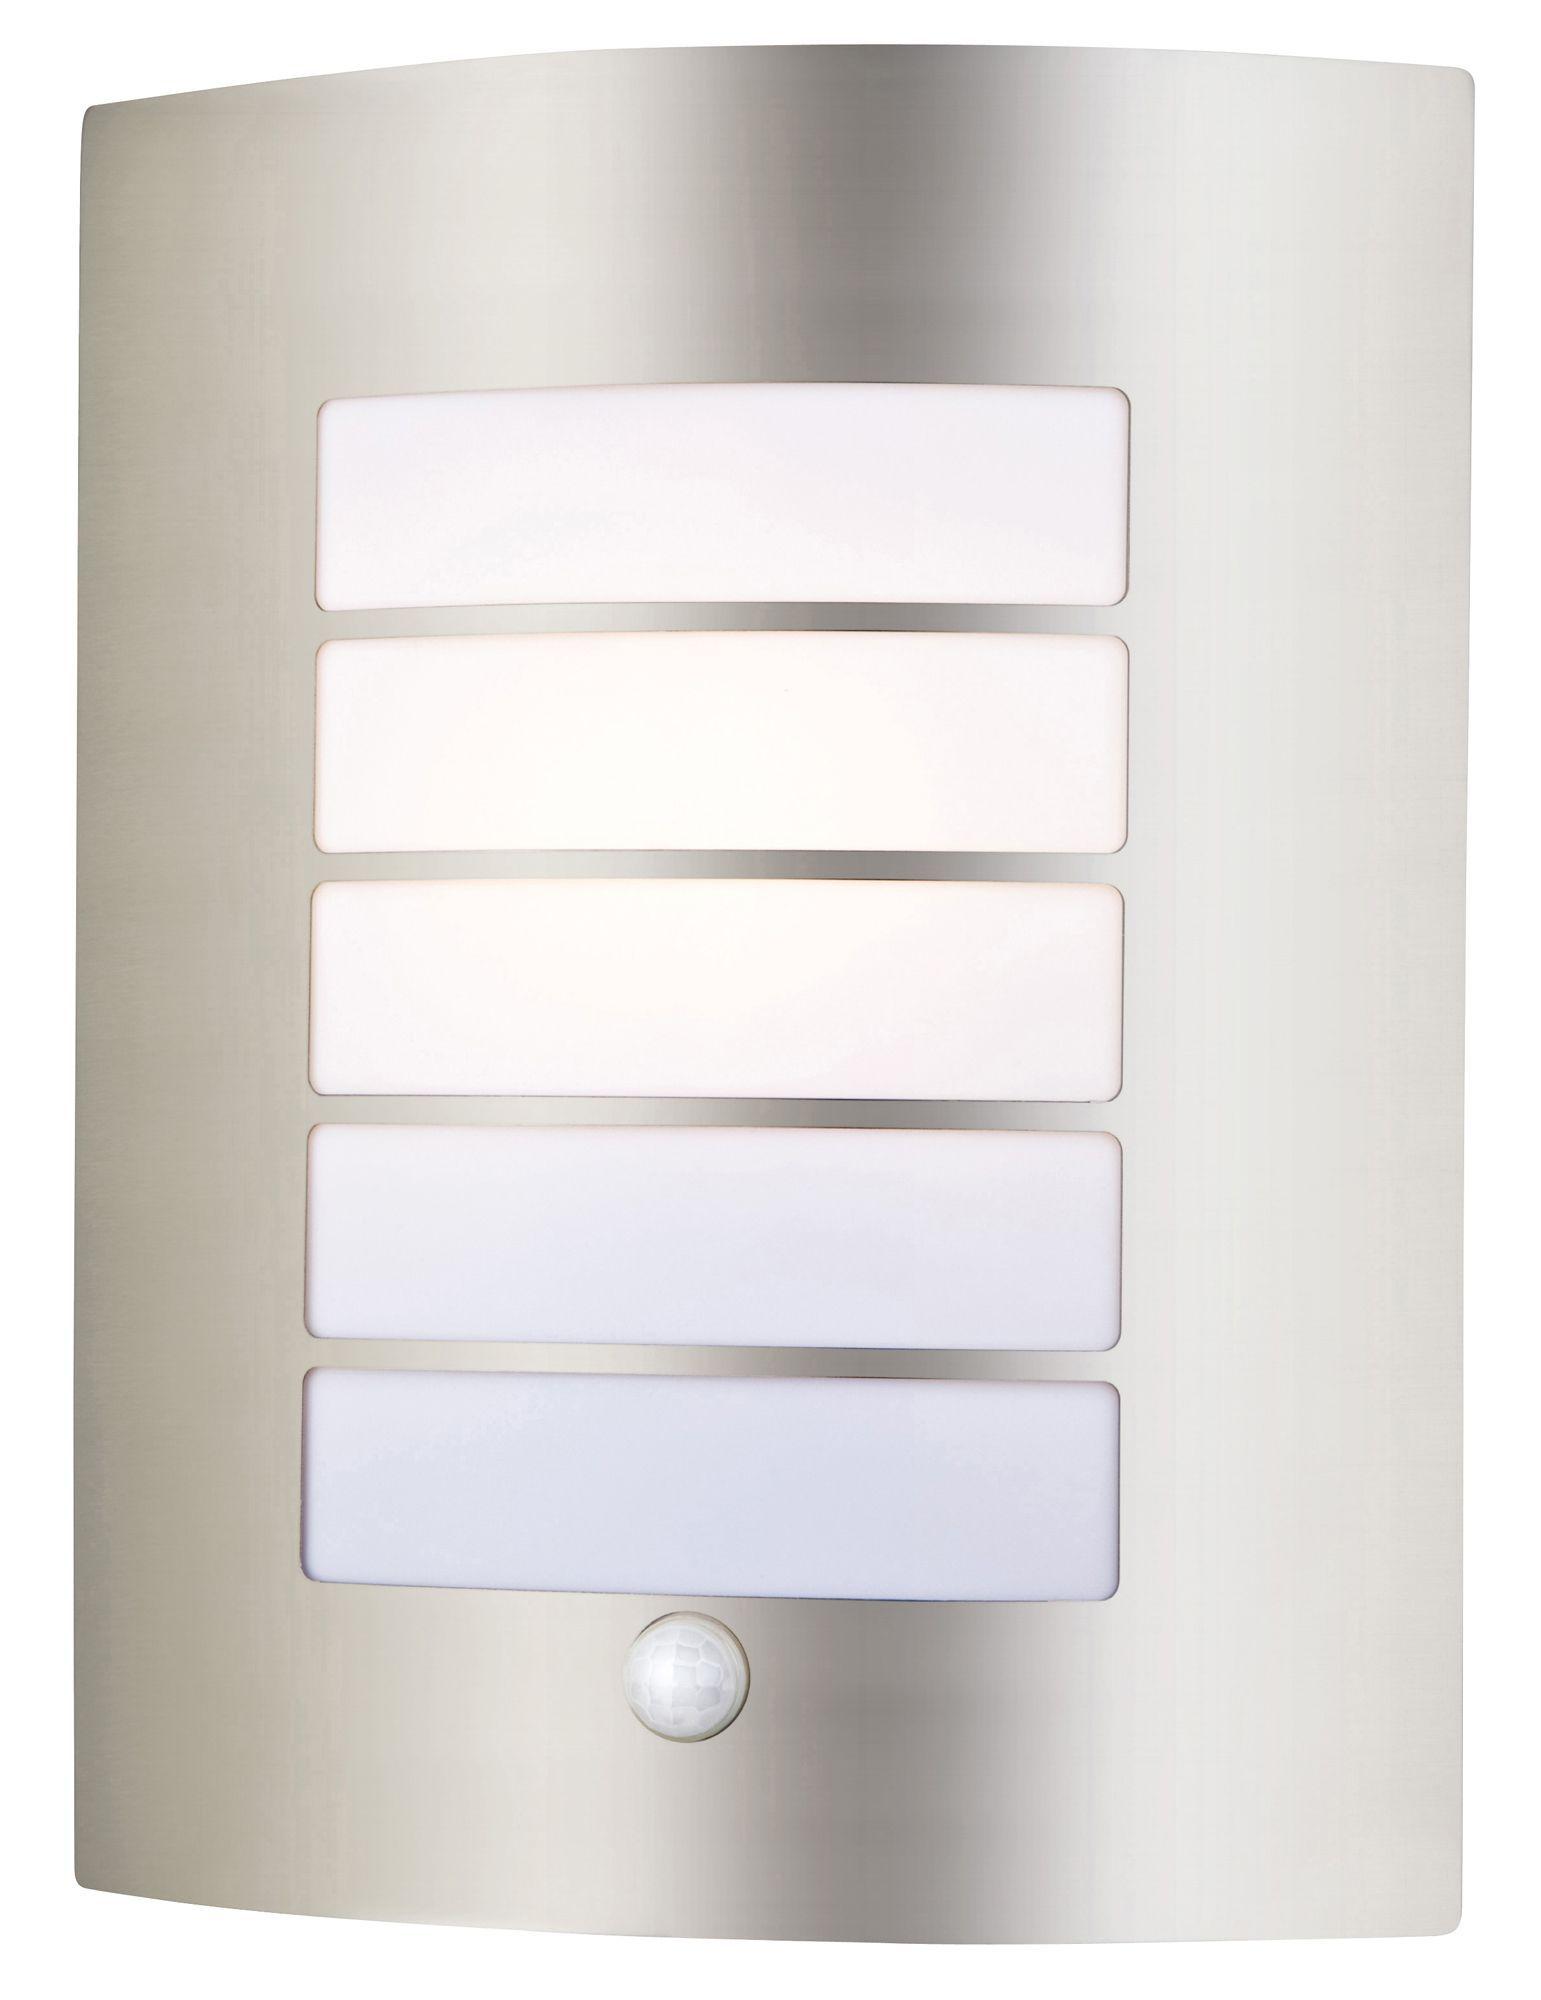 Diy at b q for Diy wall light cover